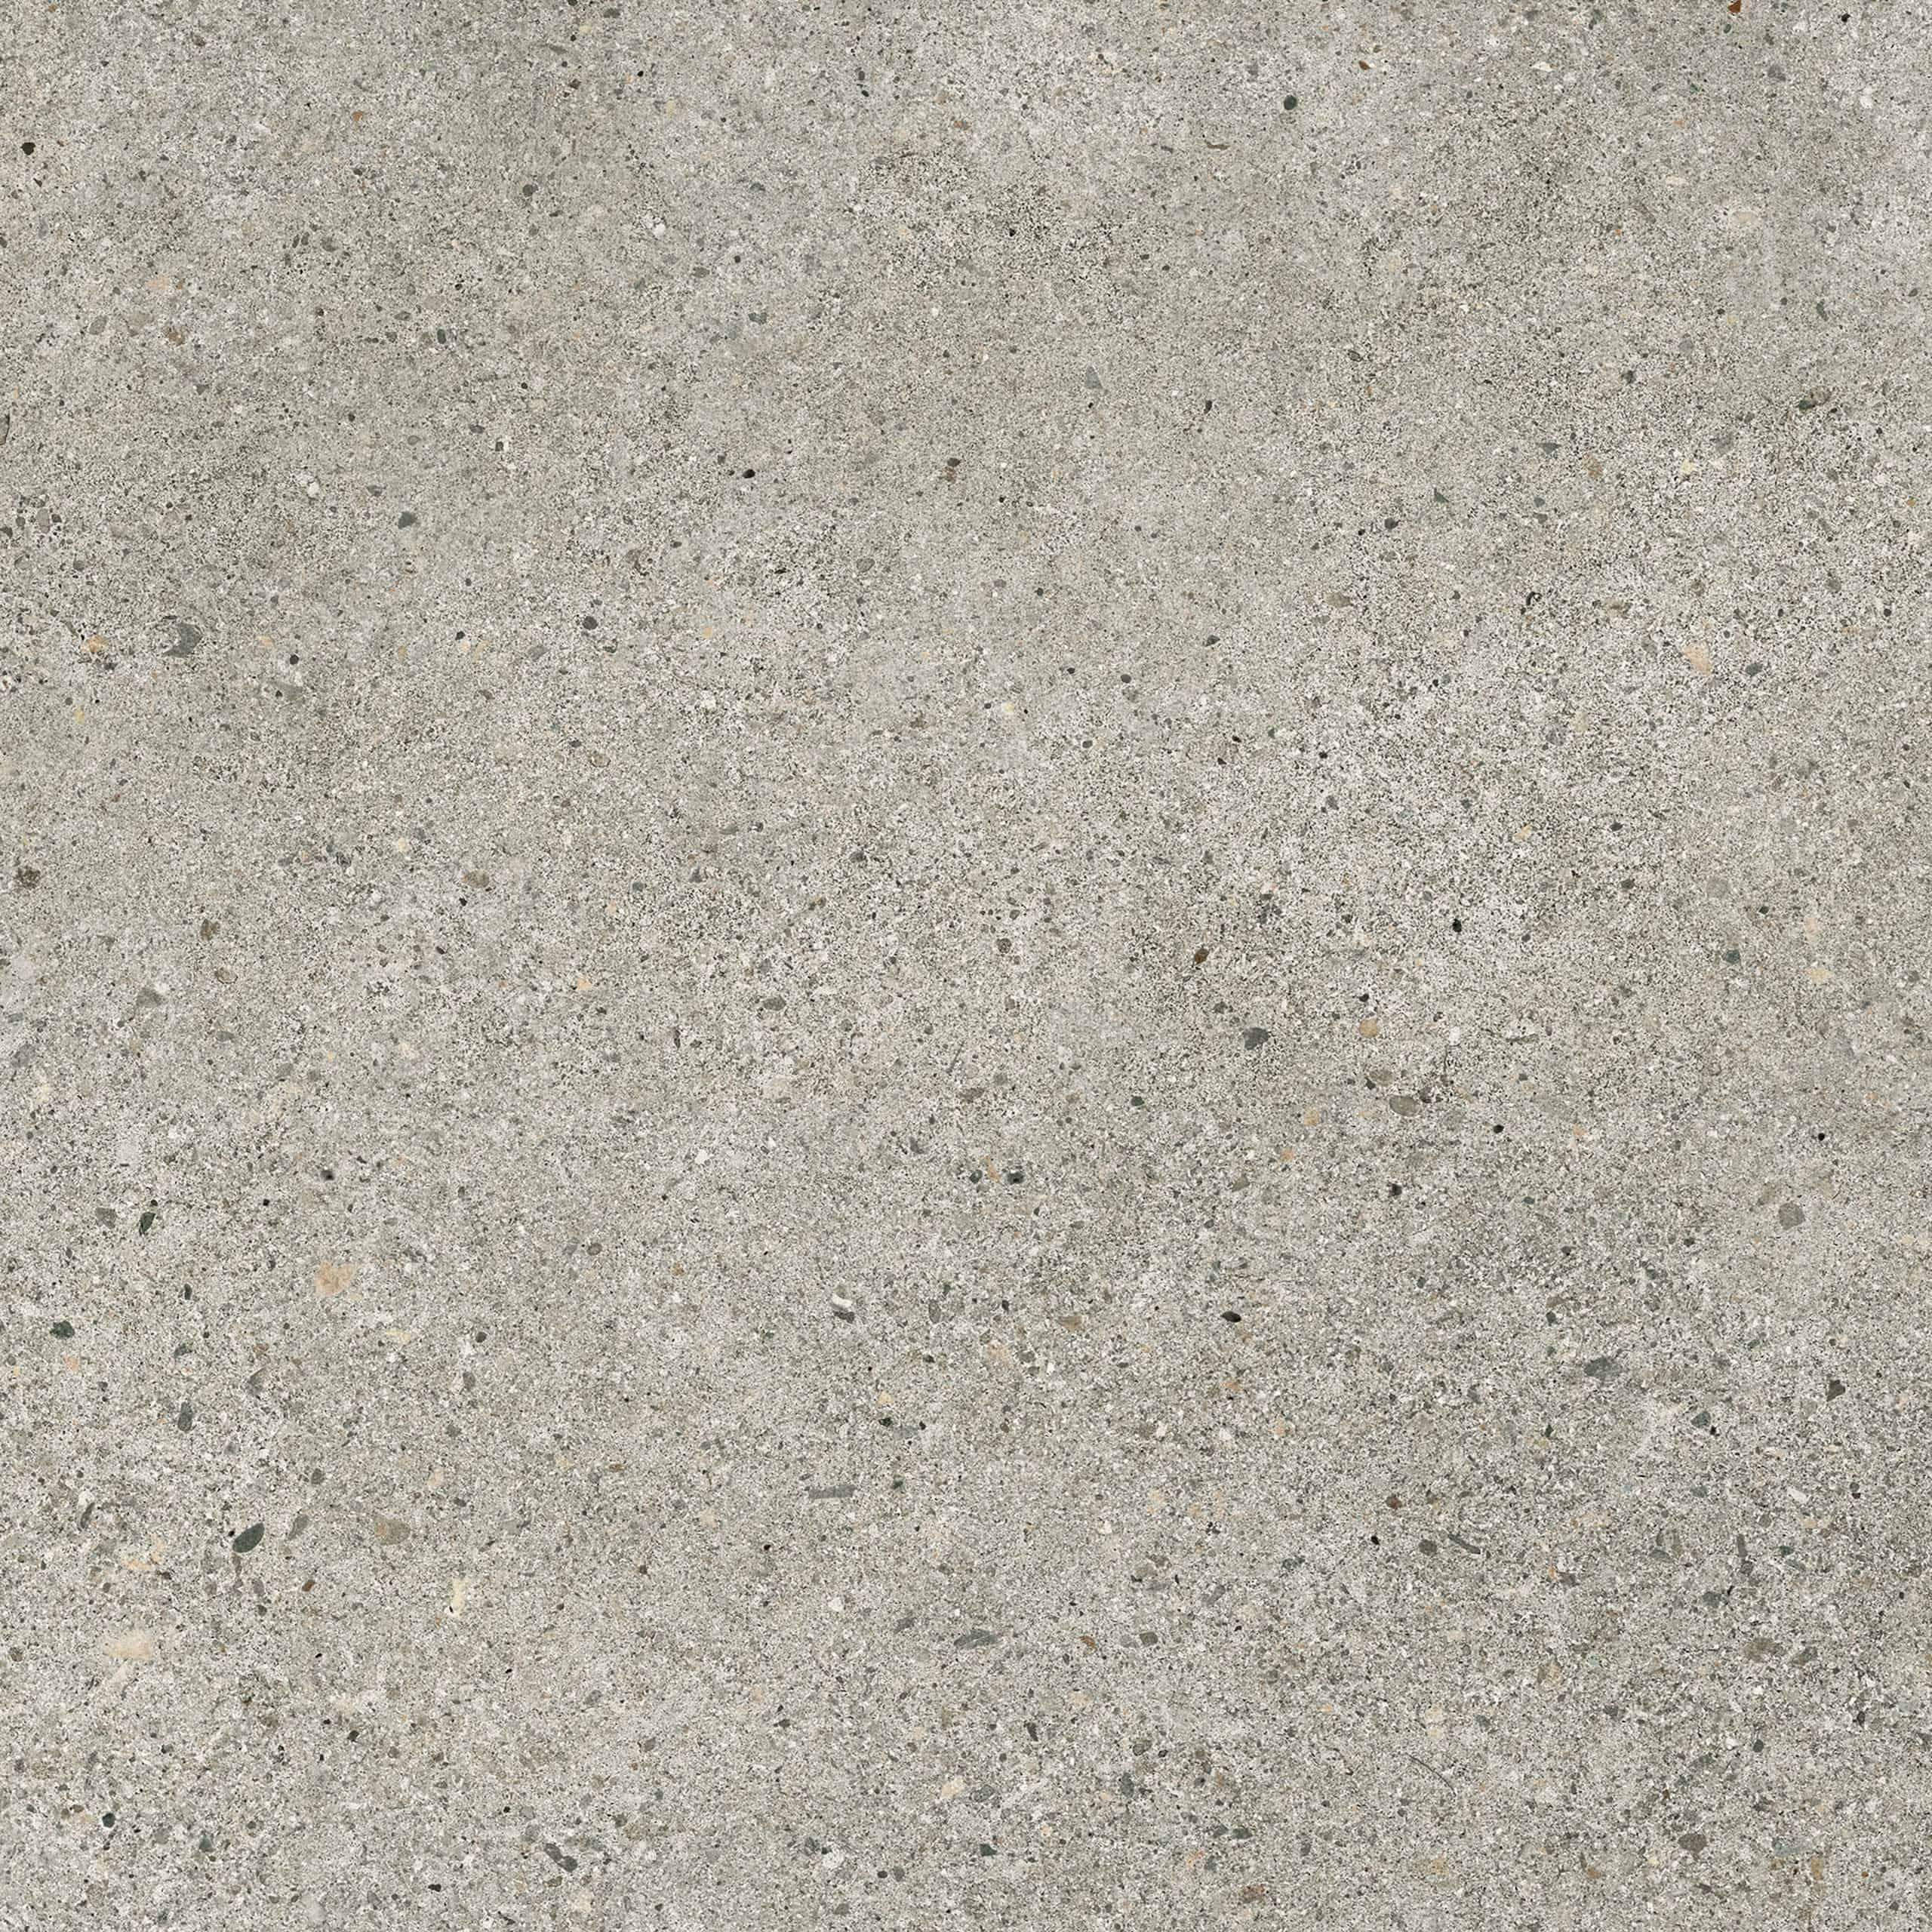 Deep Ash Tiles